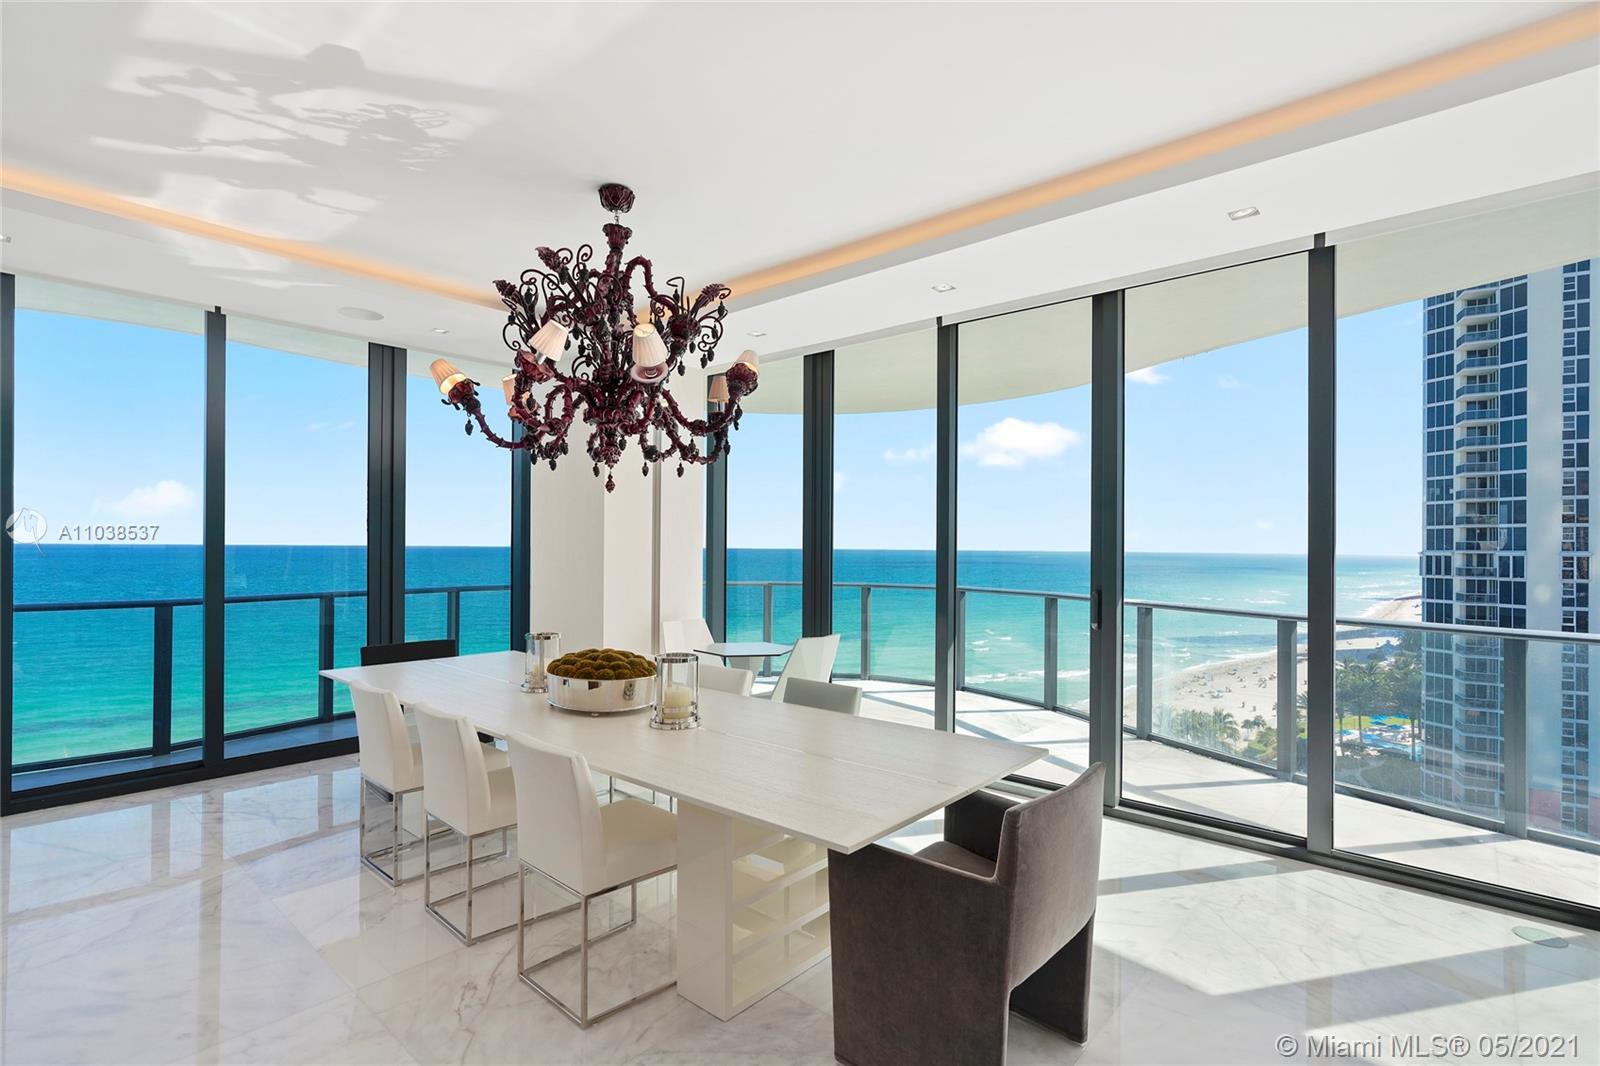 Regalia Miami #11 - 02 - photo